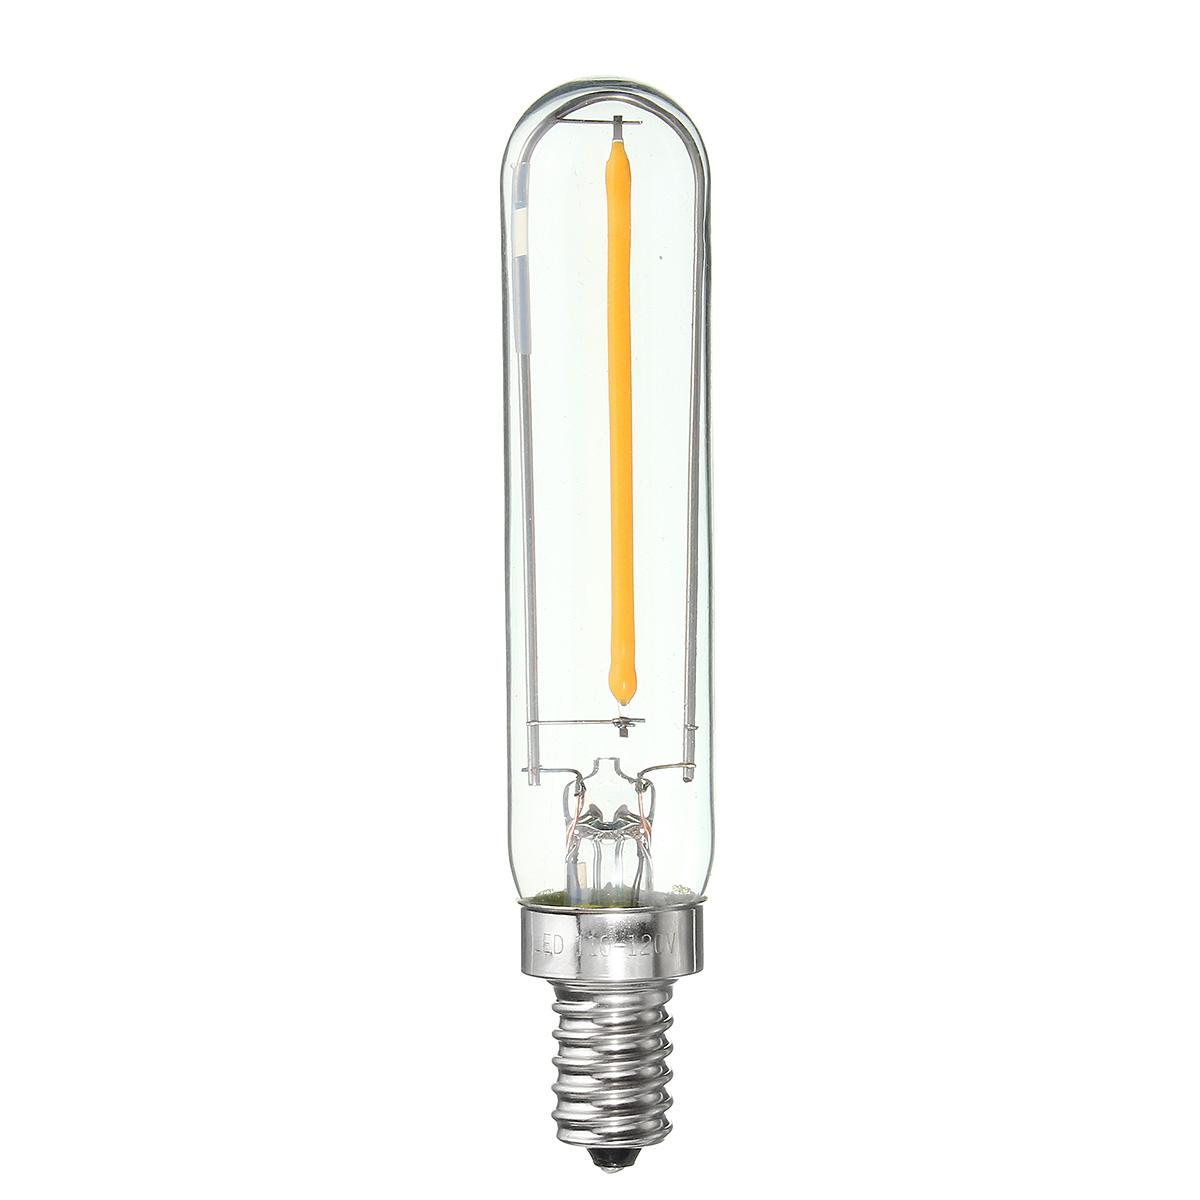 E12 E14 T120 1w 100lm Dimmable Vintage Cob Led Edison Filament Refrigerator Light Bulb Sale